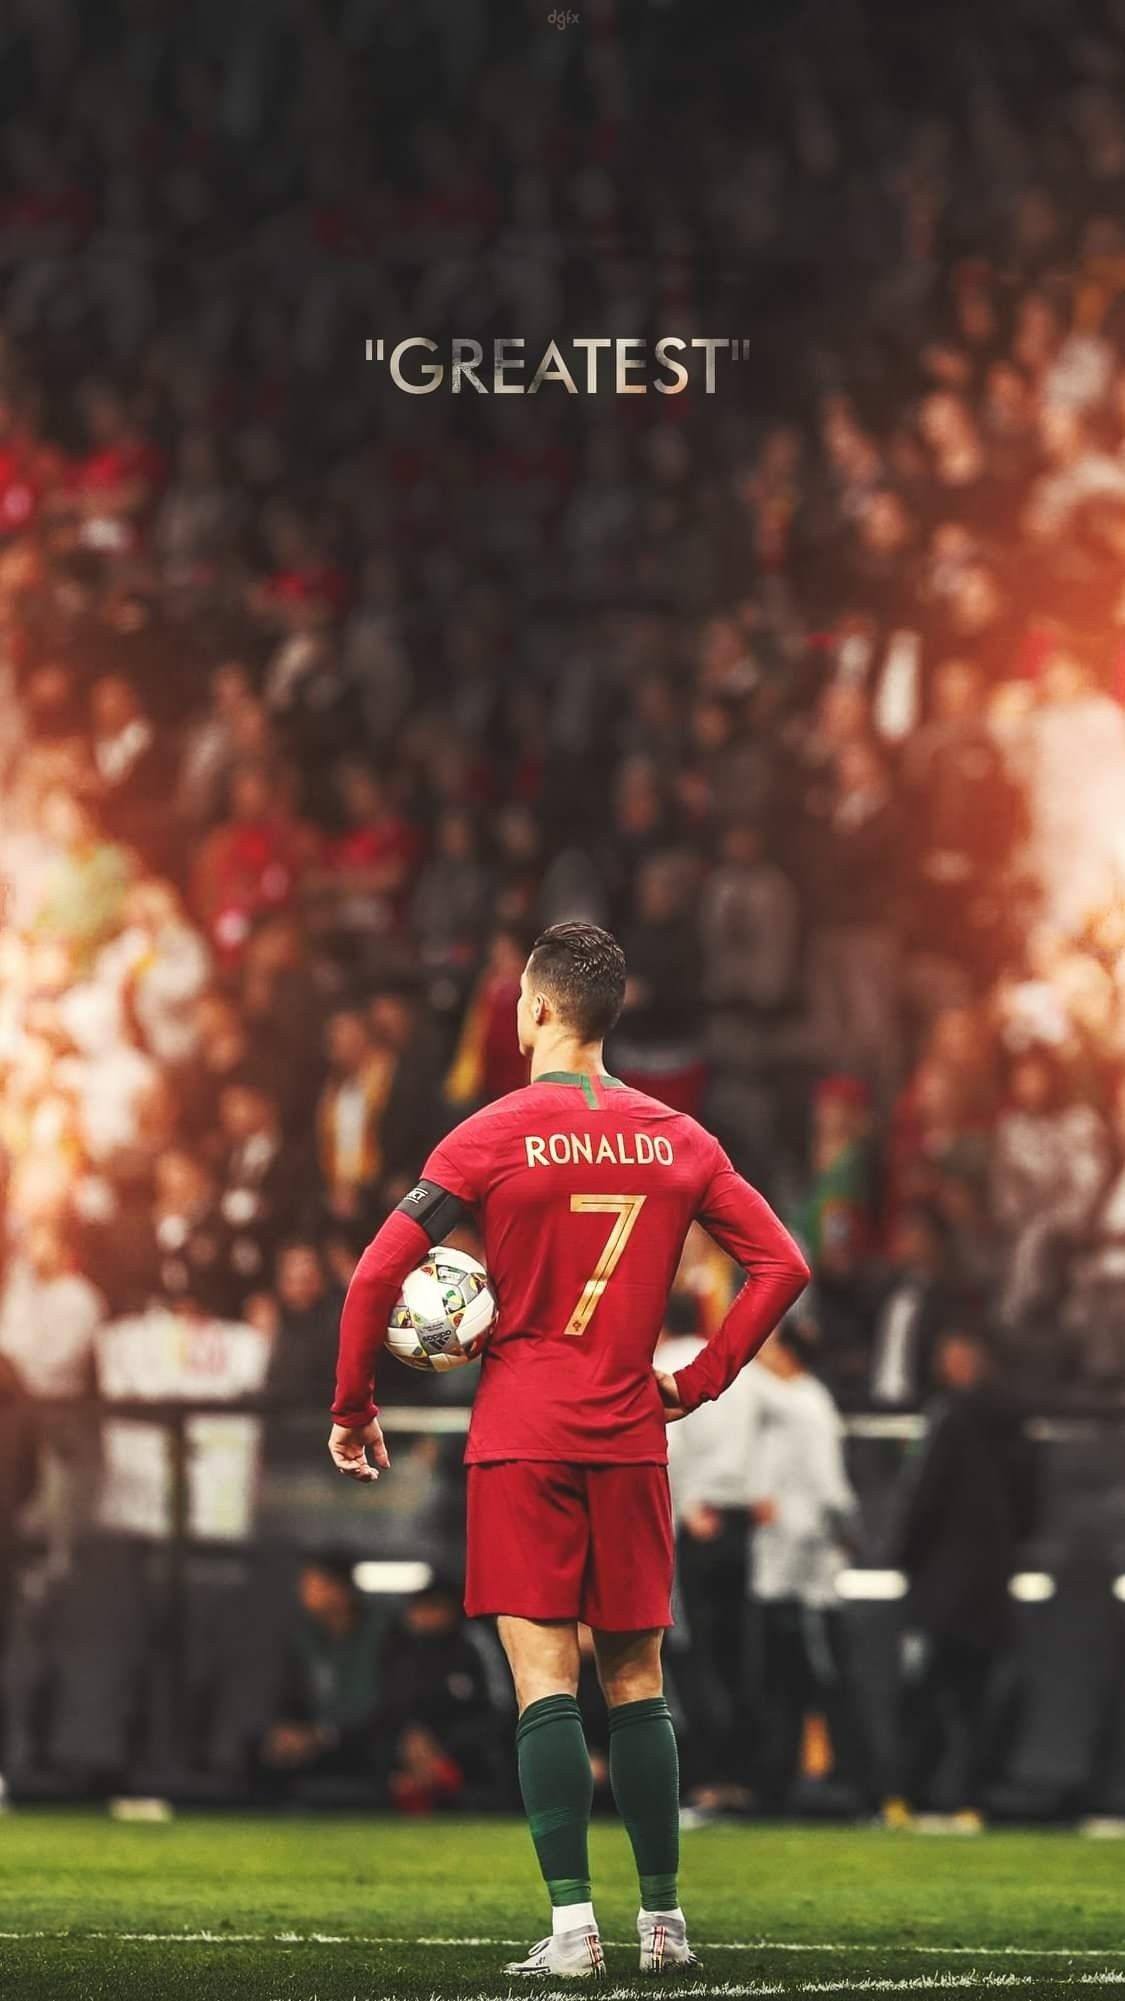 Ronaldo Wallpapers Photography Cristiano Ronaldo Celebrity Wallpaper Cristiano Ronaldo Quotes Ronaldo Quotes Ronaldo